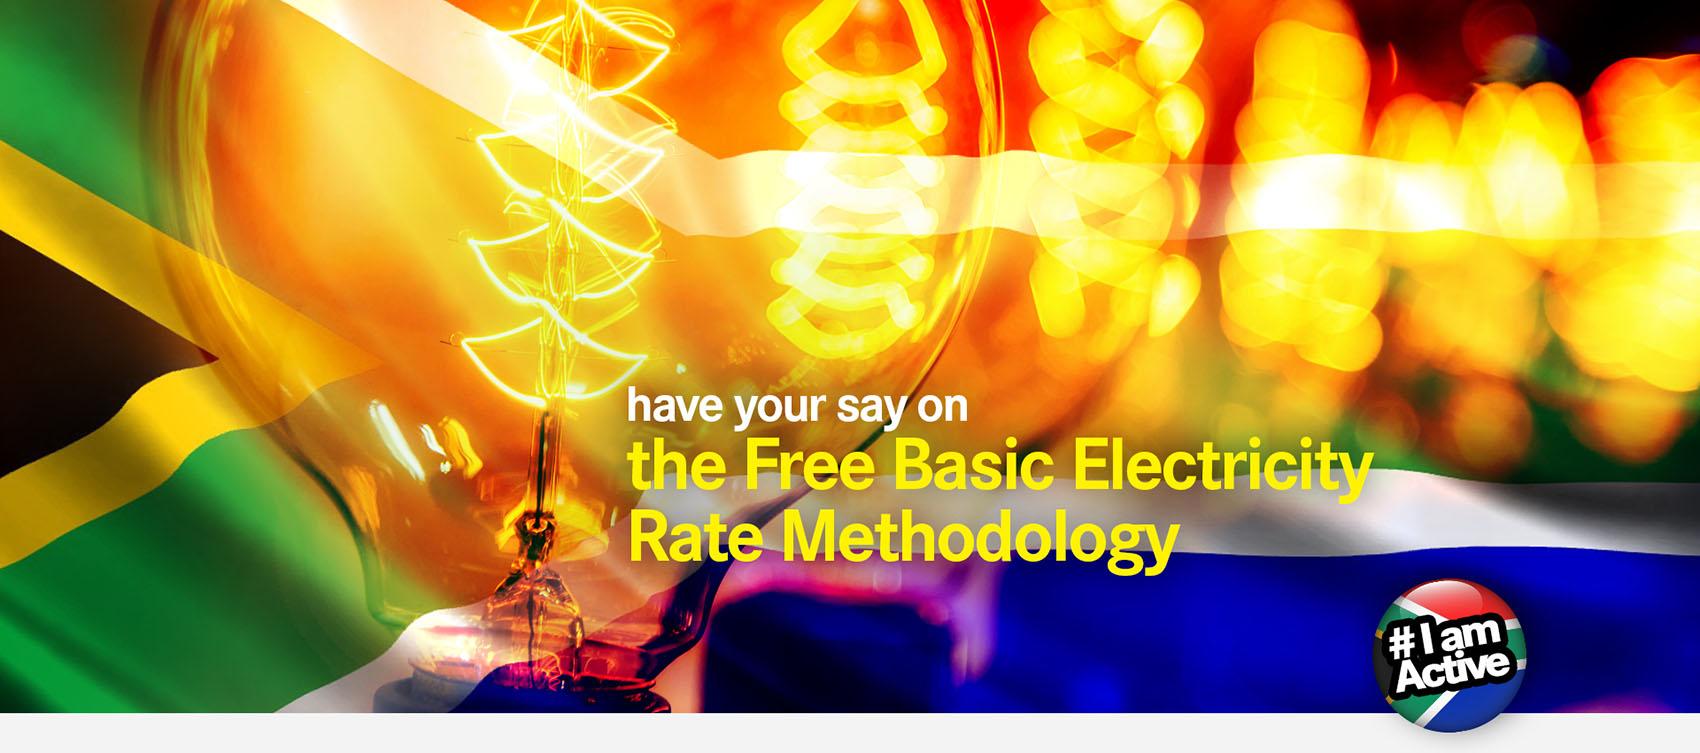 DearSA-Free-Basic-Electricity